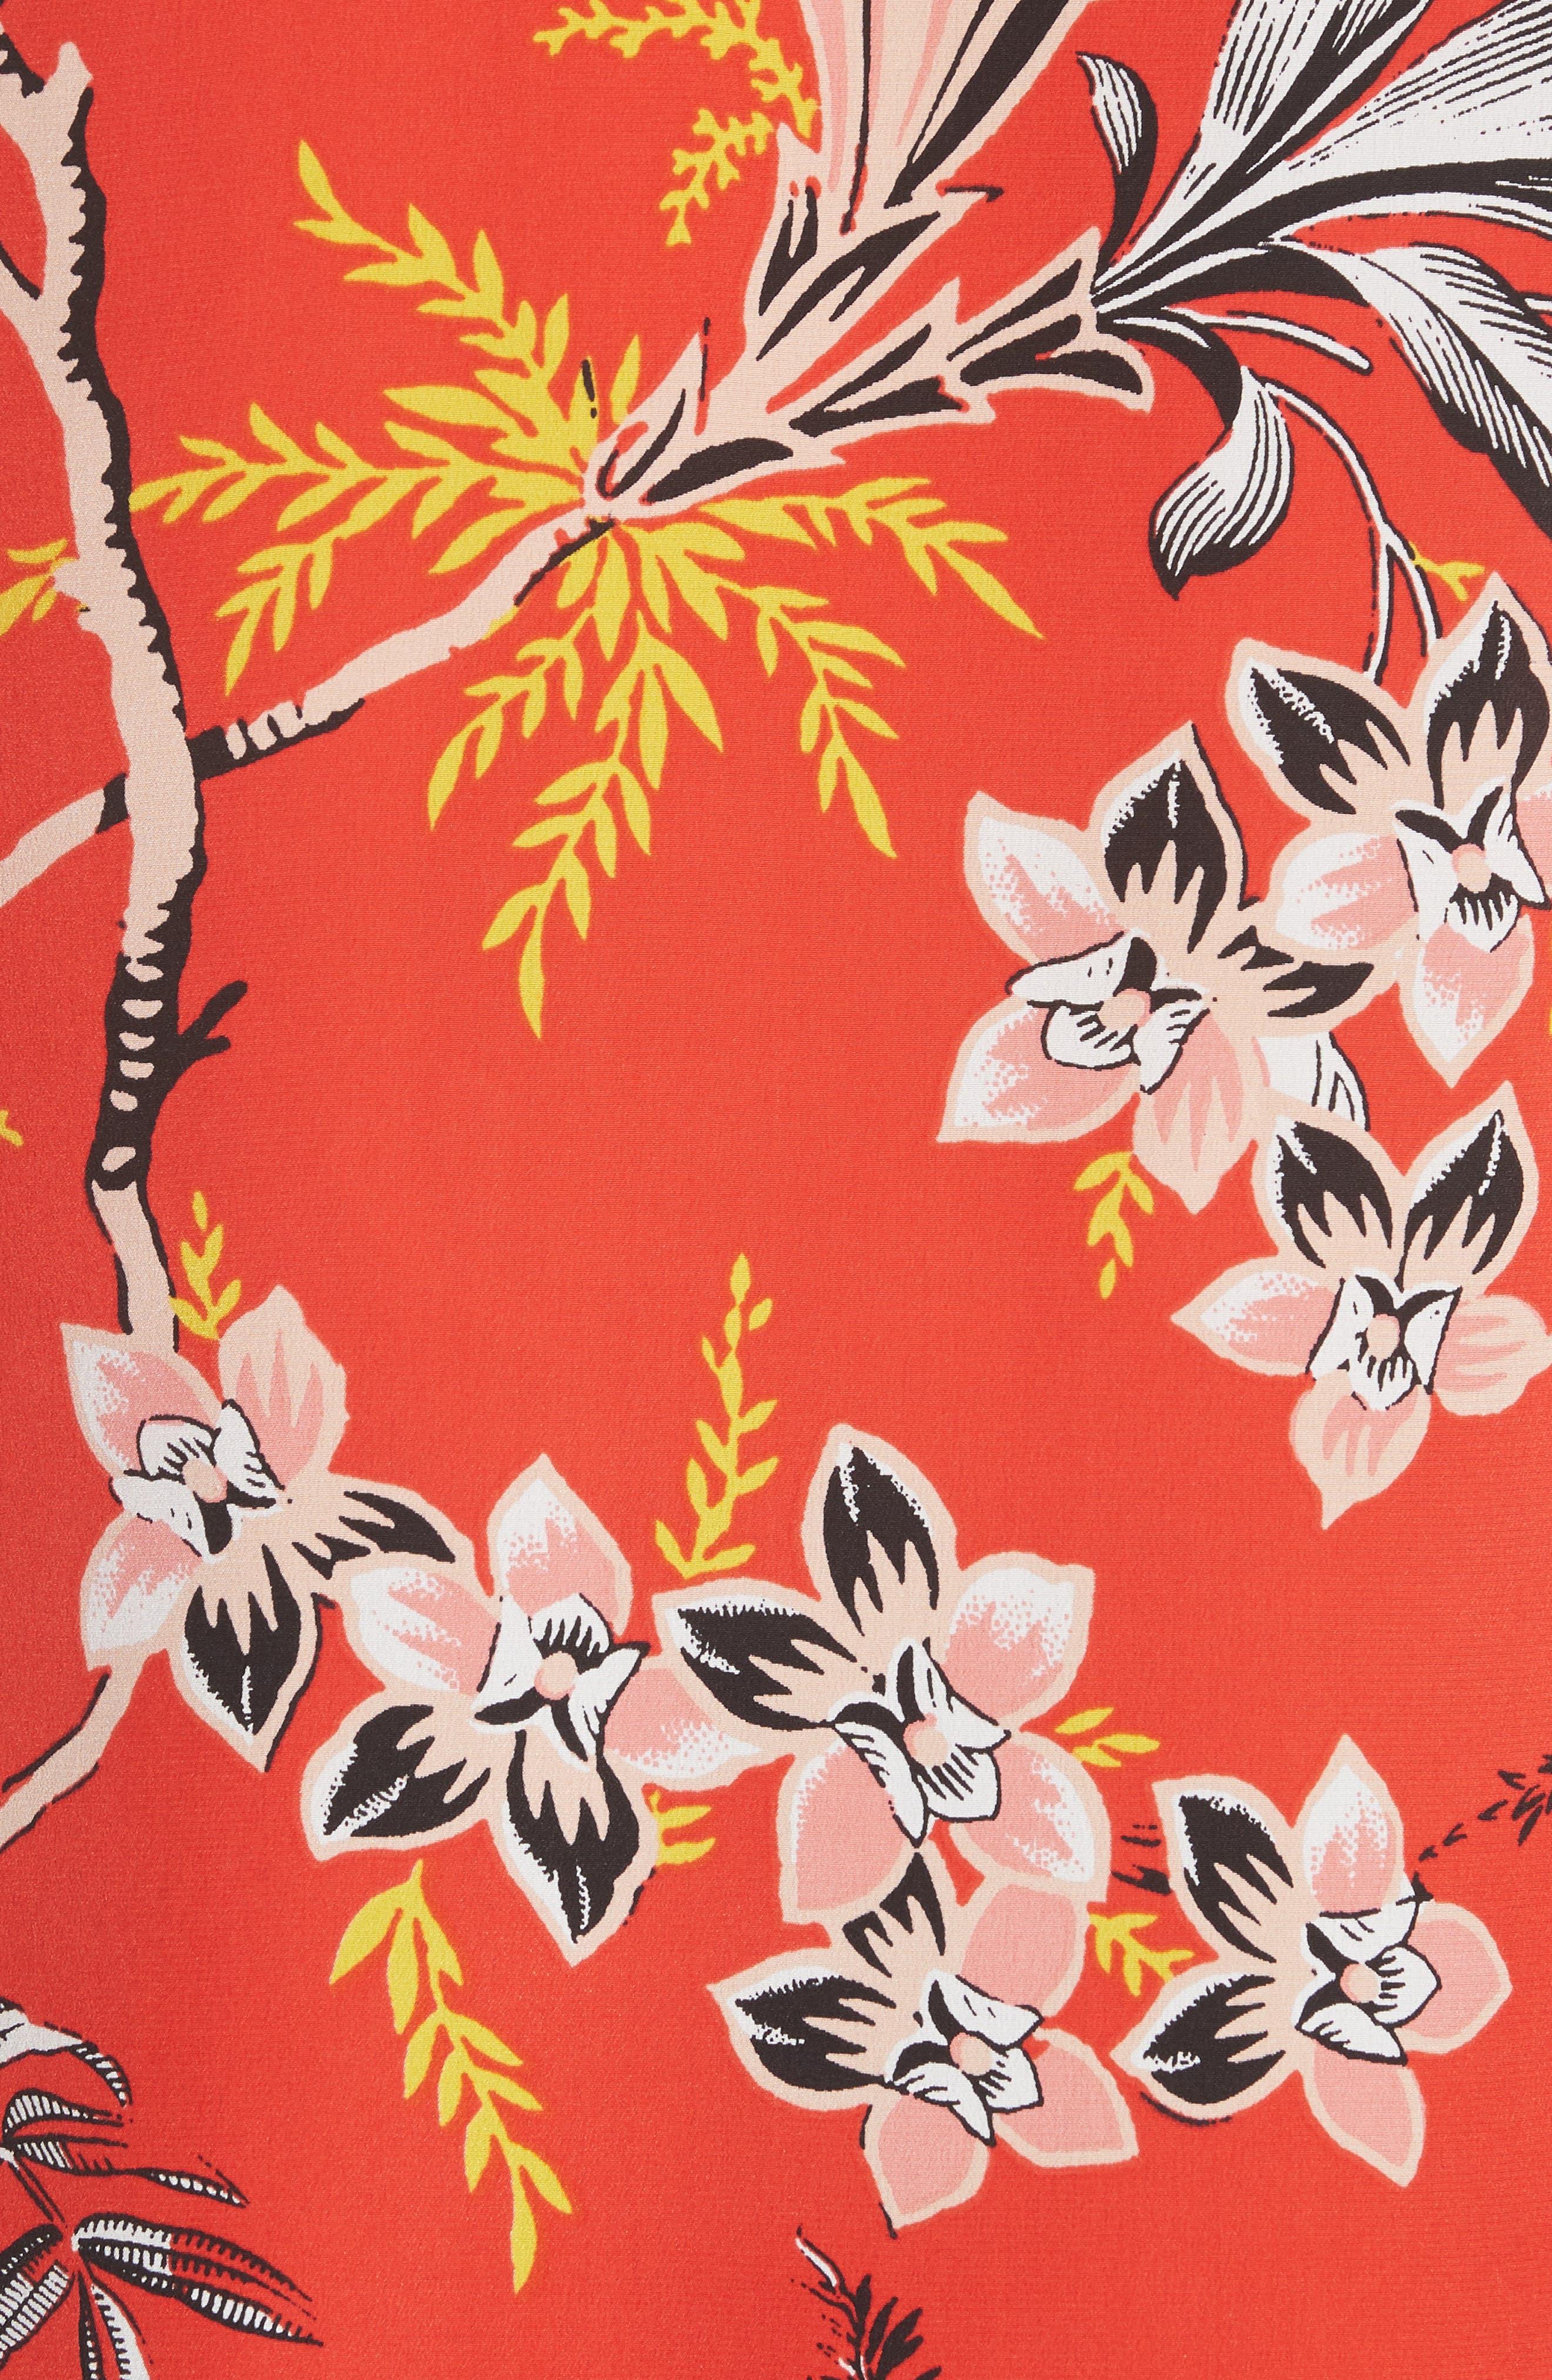 Keyhole Print Silk Blouse,                             Alternate thumbnail 5, color,                             Avalon Poppy